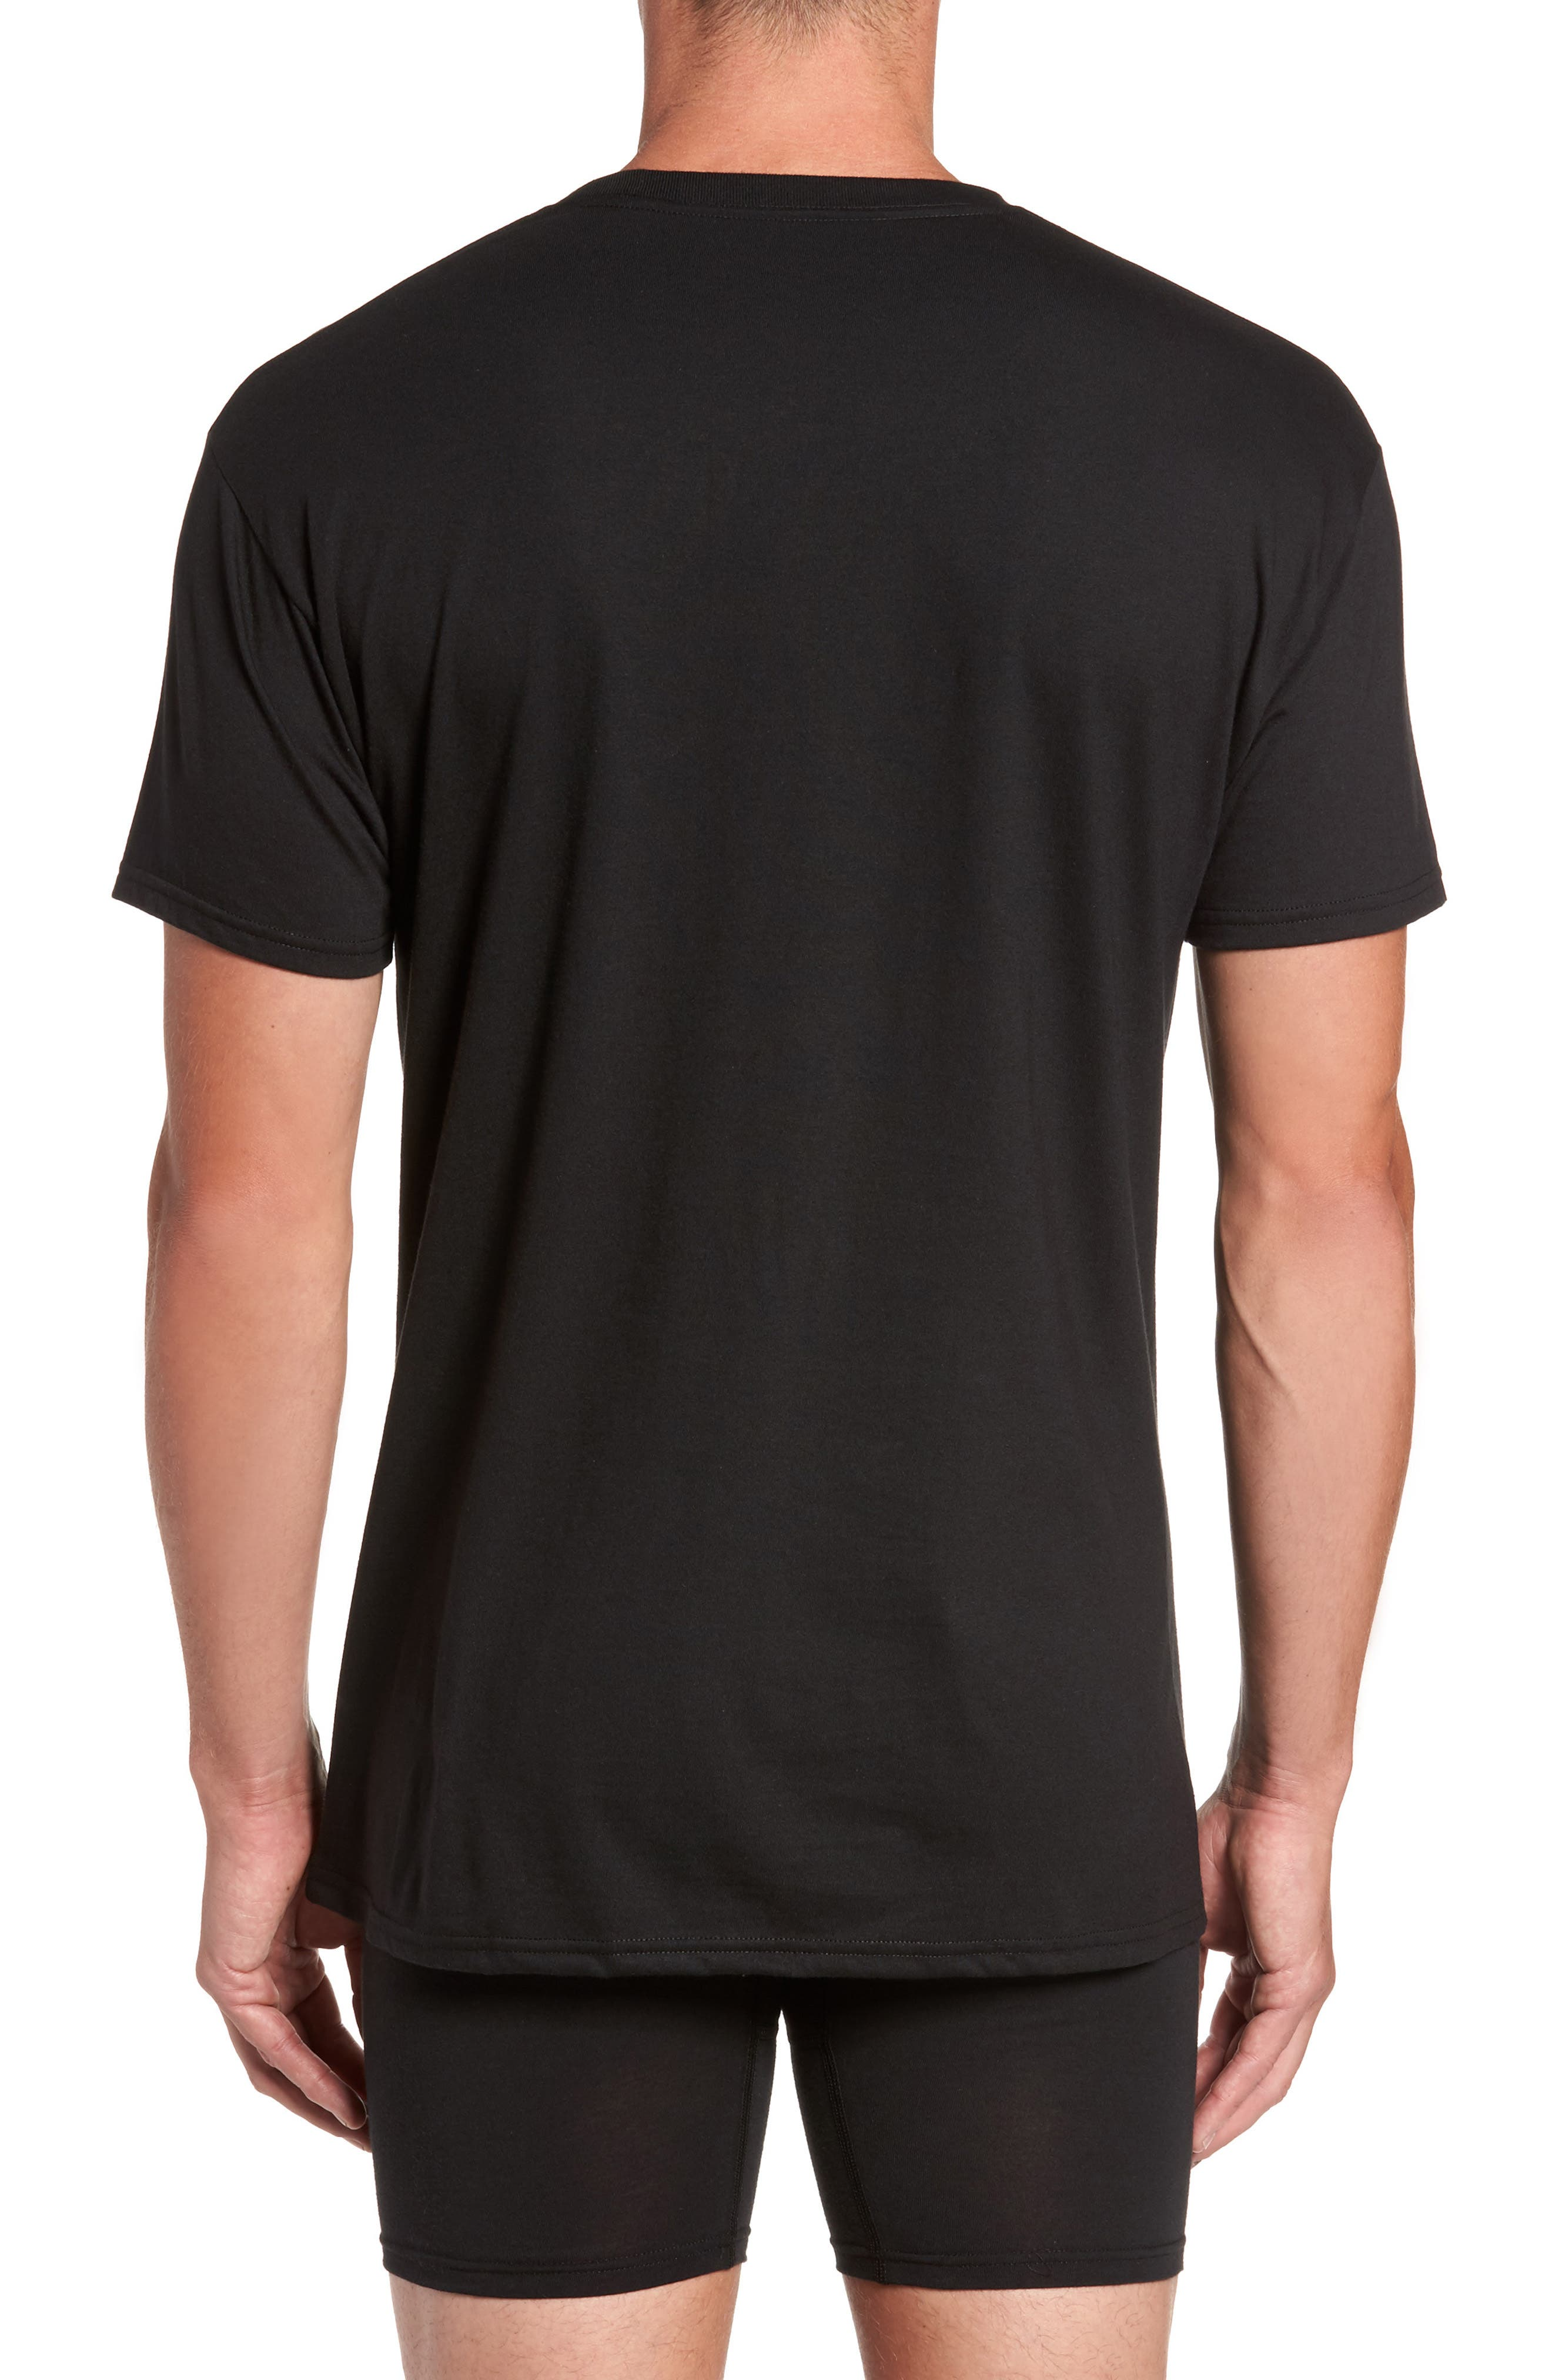 Alternate Image 3  - Hanes Luxury Essentials 3-Pack V-Neck T-Shirt